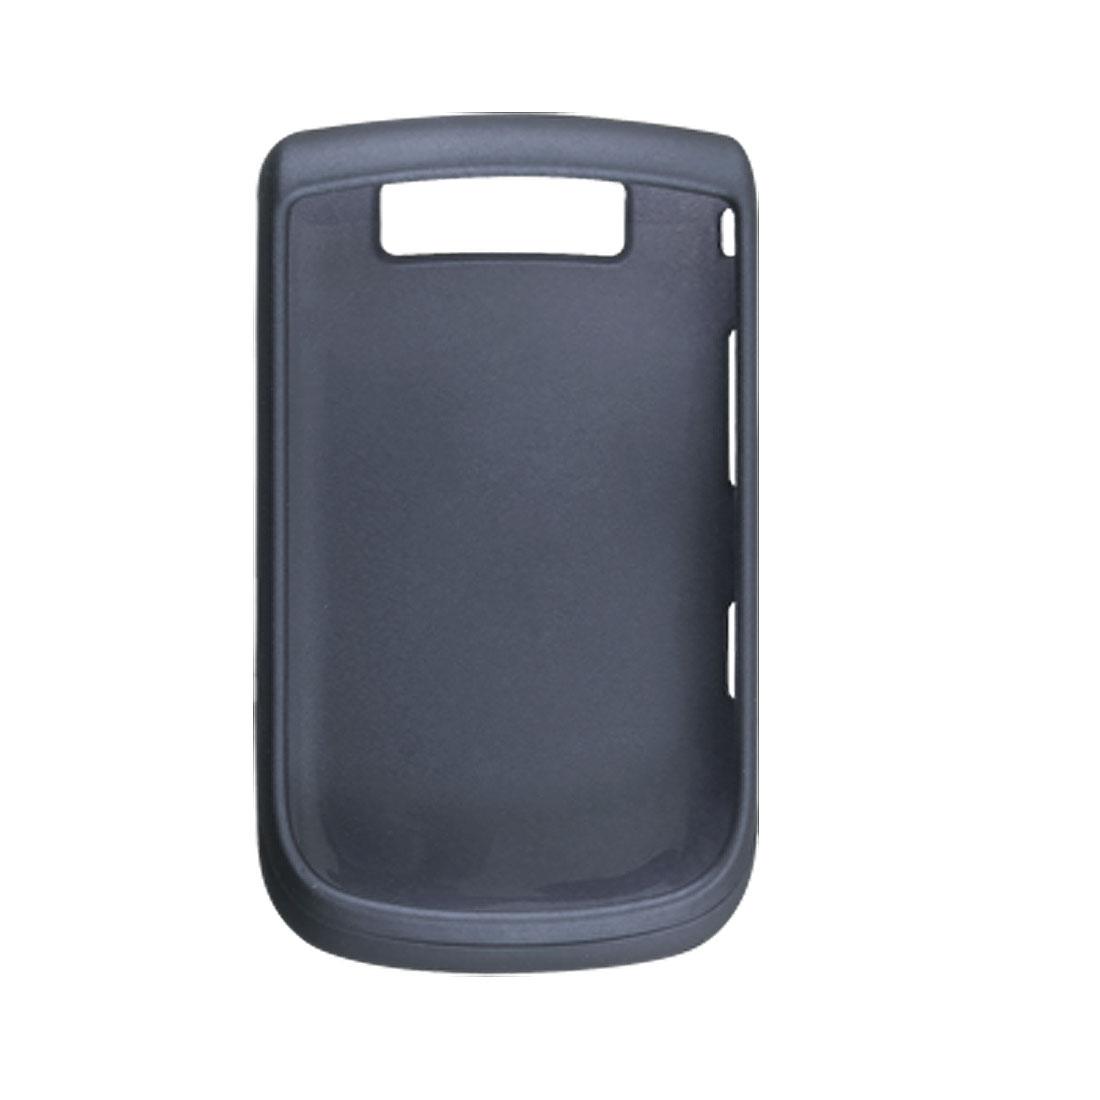 Navy Blue Rubberized Plastic Cover for Blackberry 9800